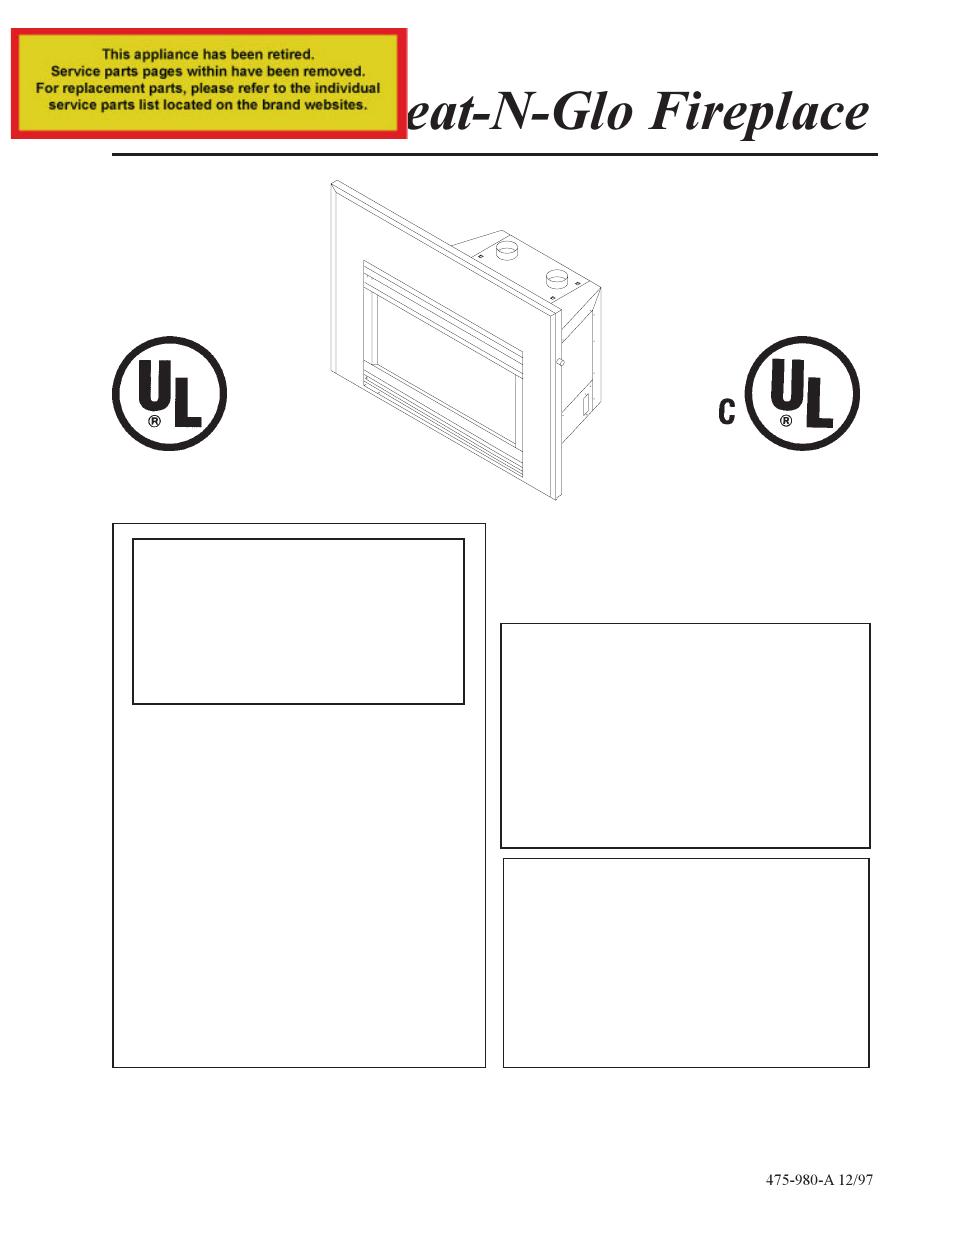 Heat Glo Fireplace Heat Glo Fireplace At Grand User Manual 23